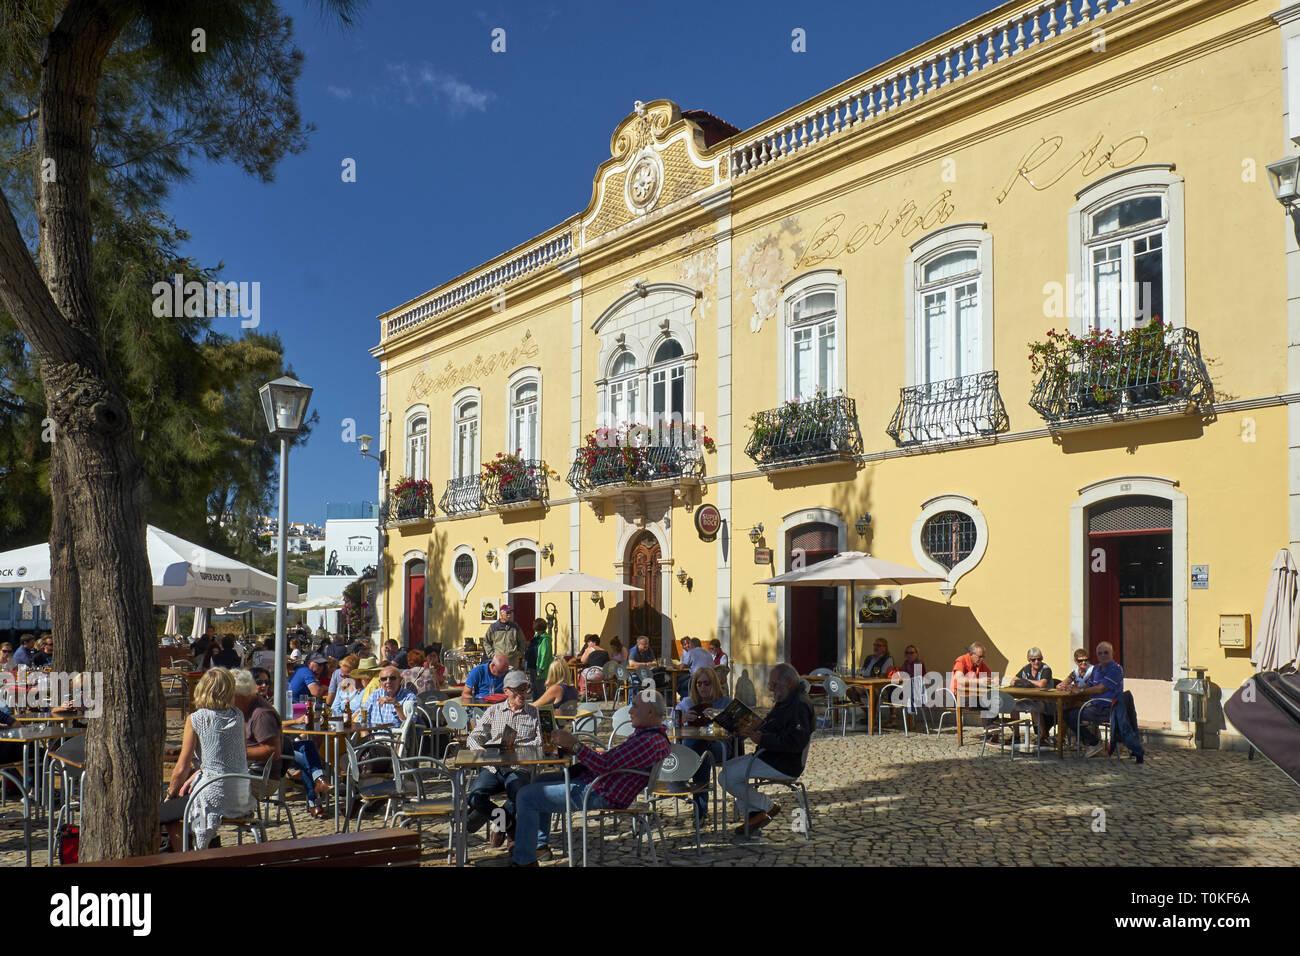 Restaurant en plein air sur In The Golfer's Paradise à Tavira, Faro, Algarve, Portugal Banque D'Images